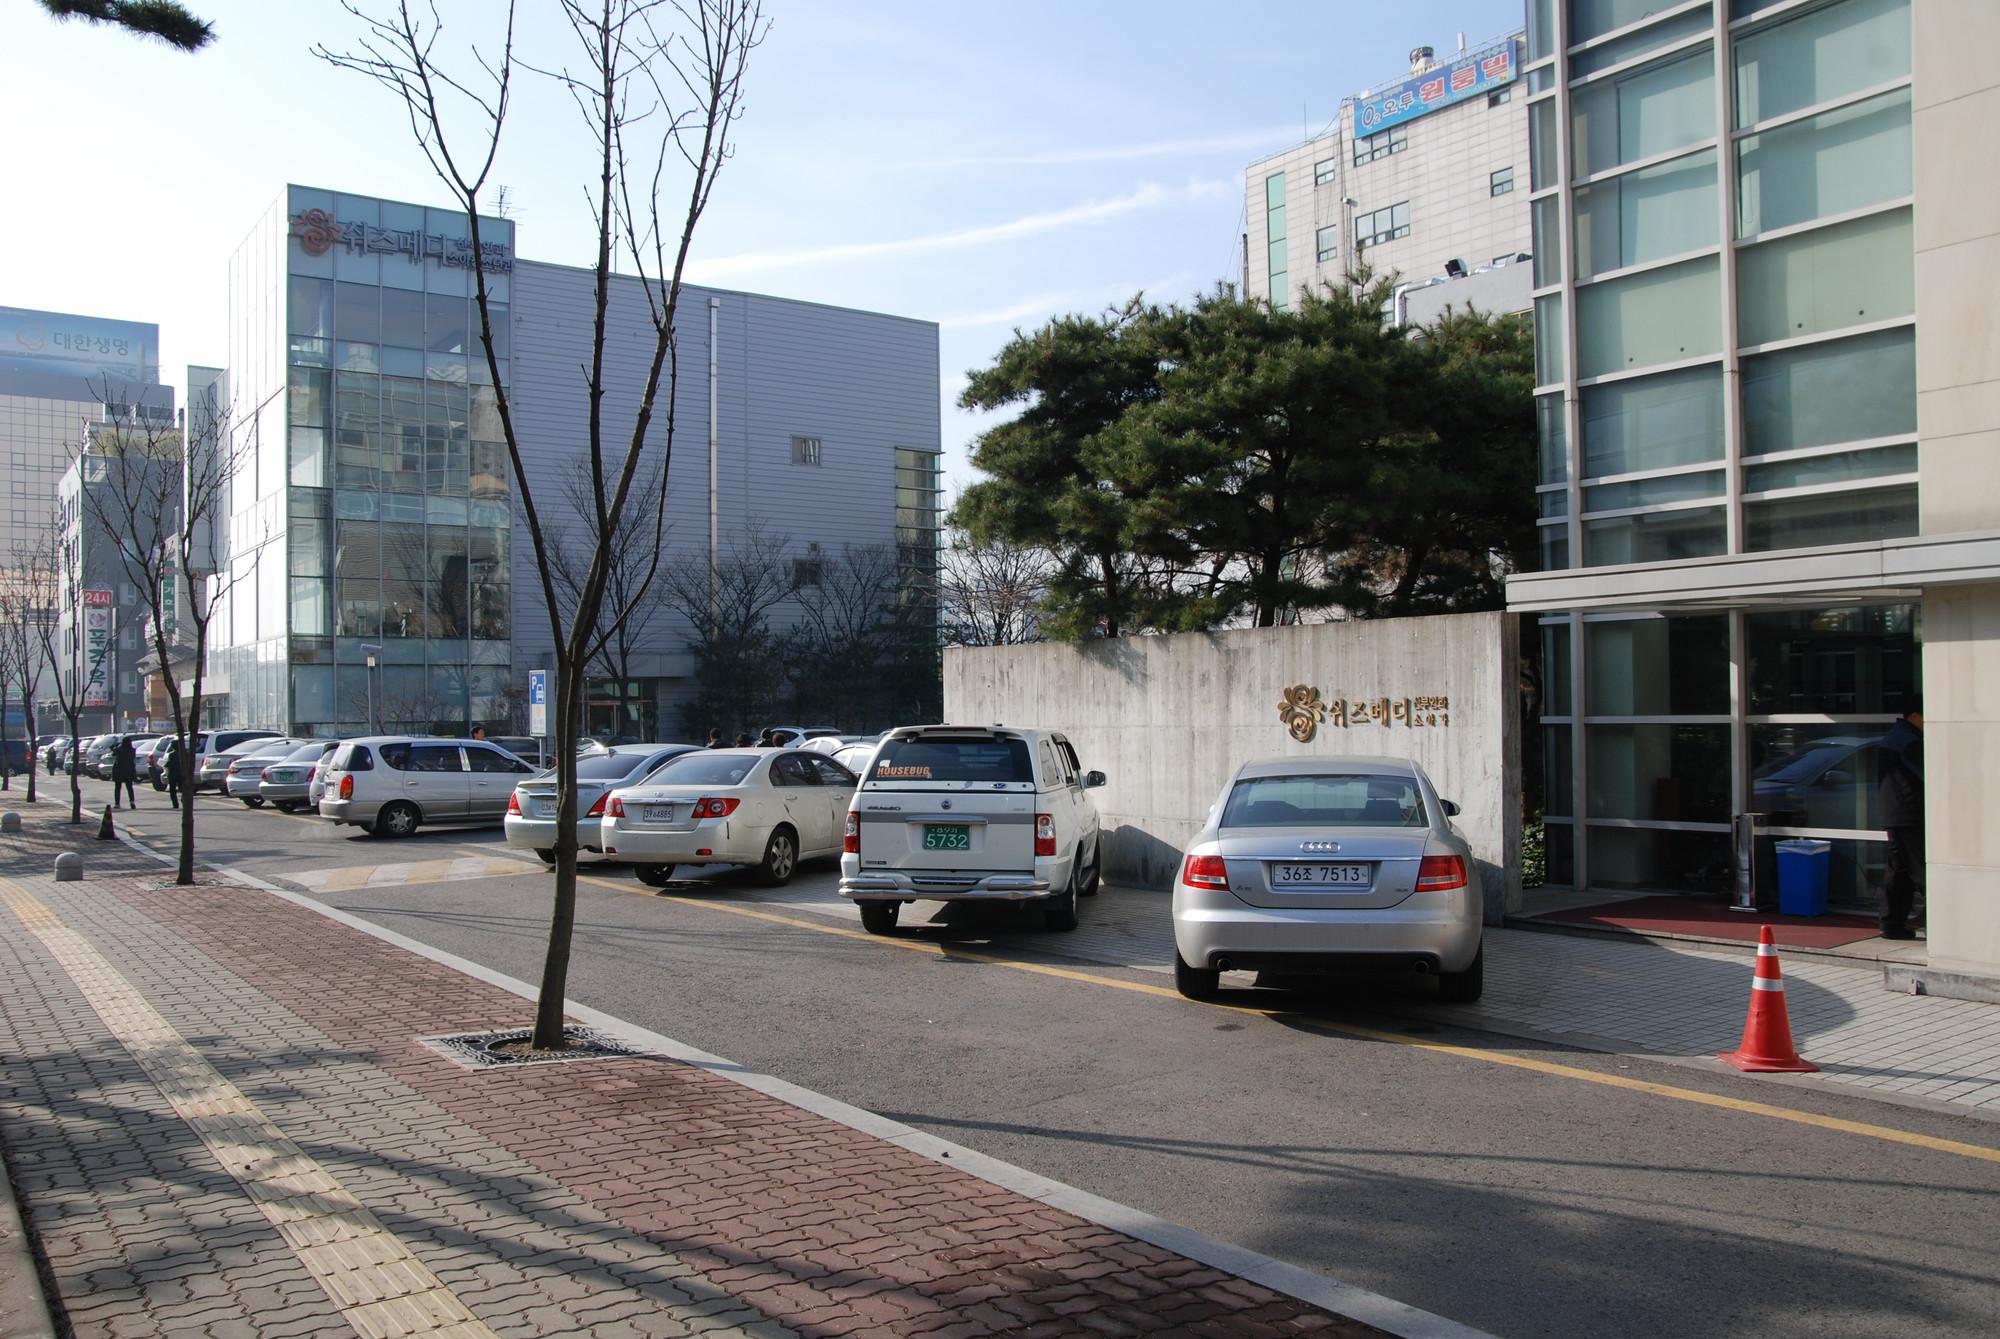 Shesmedi Hospital / Yeonghwan Lim + Sunhyun Kim